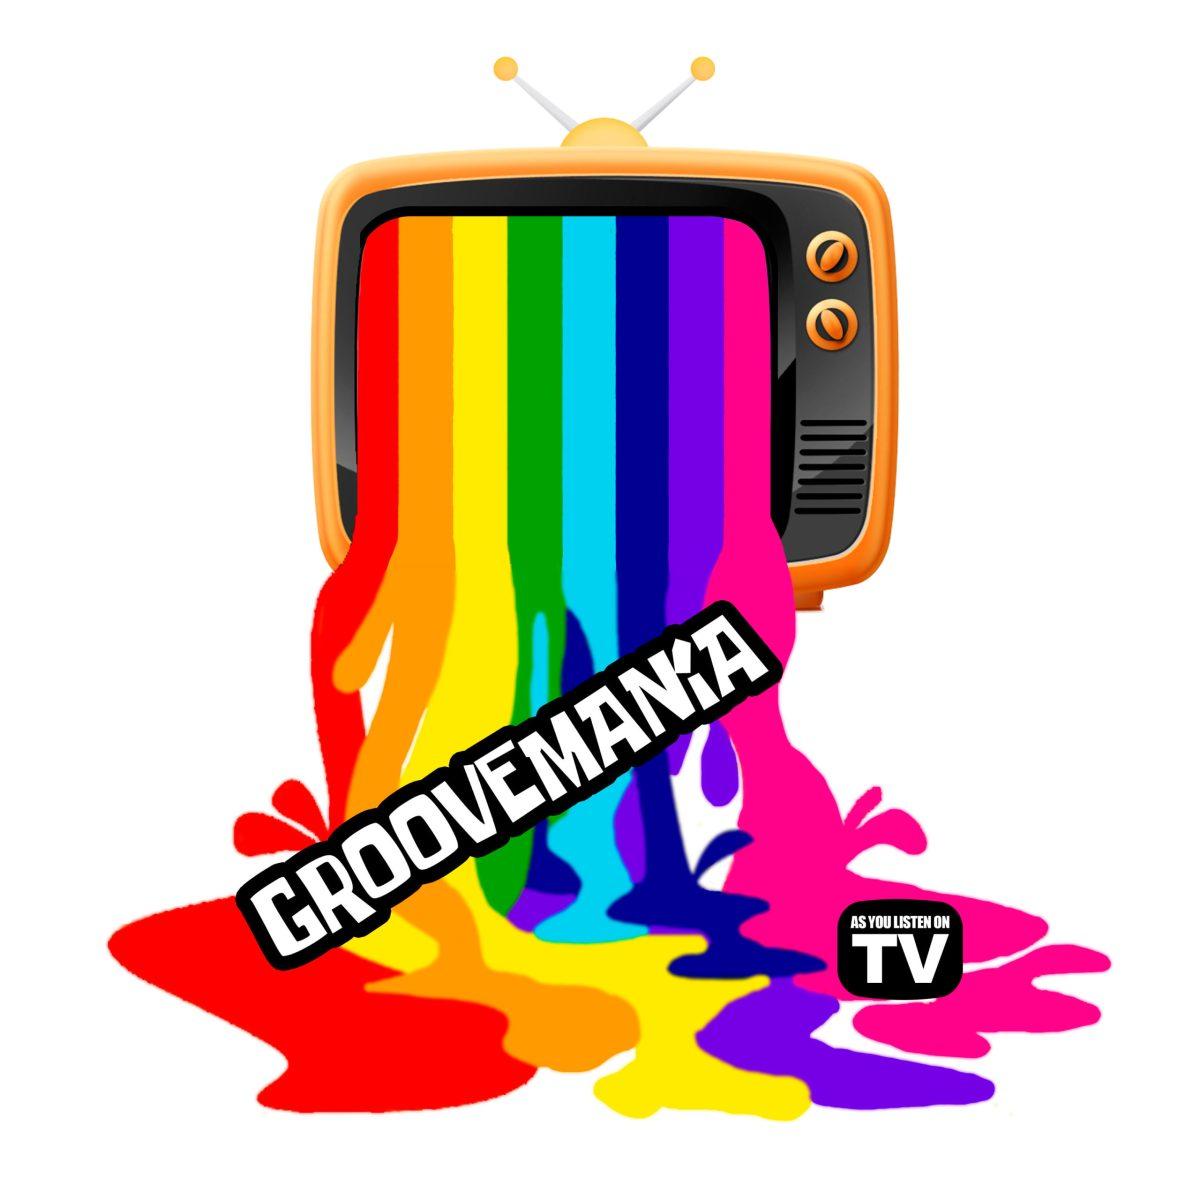 Groovemania